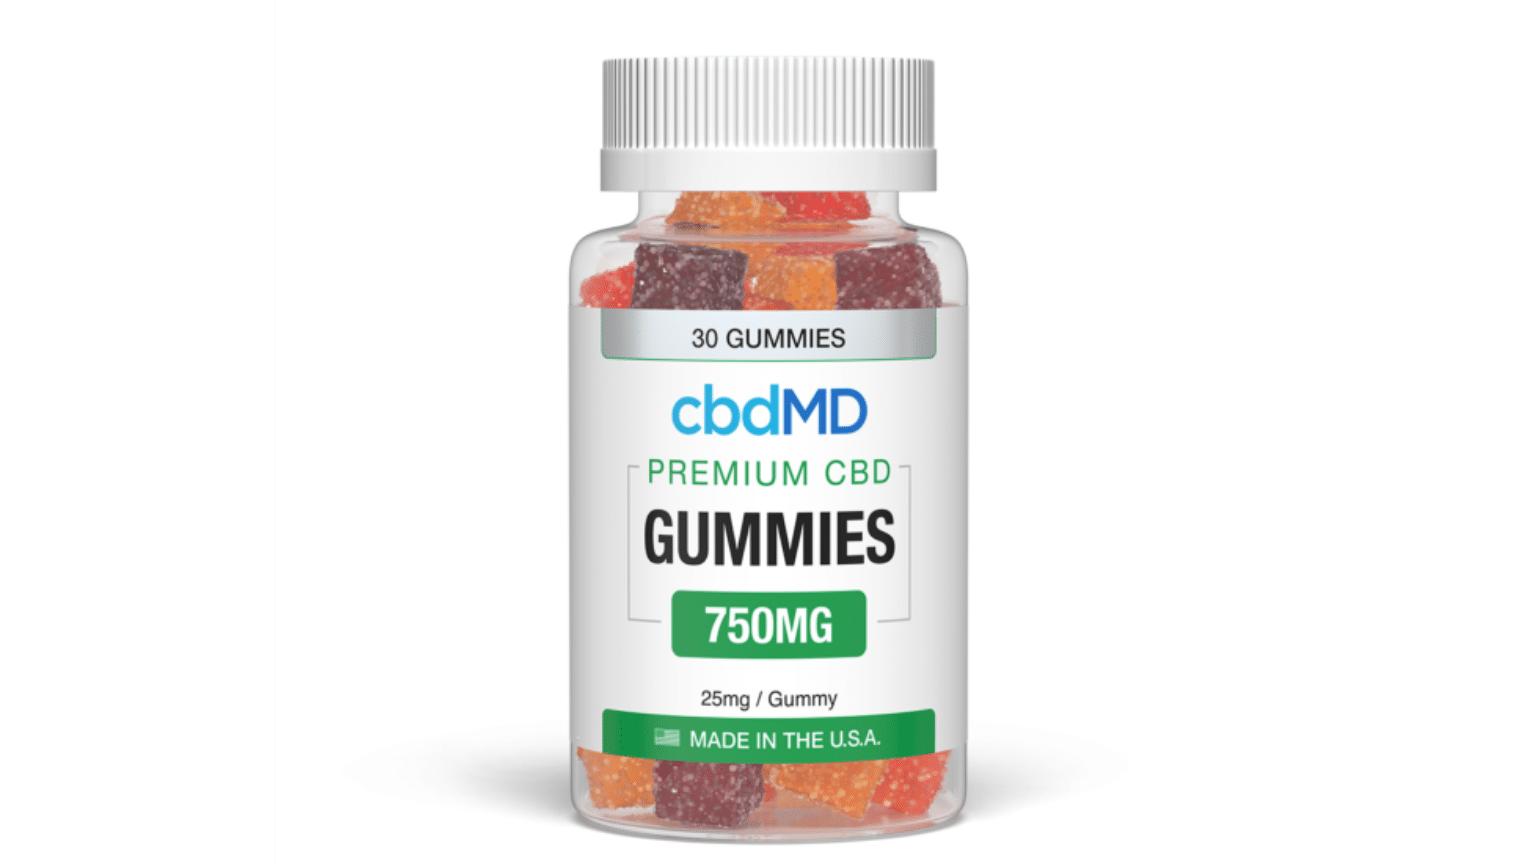 cbdmd-gummies-750